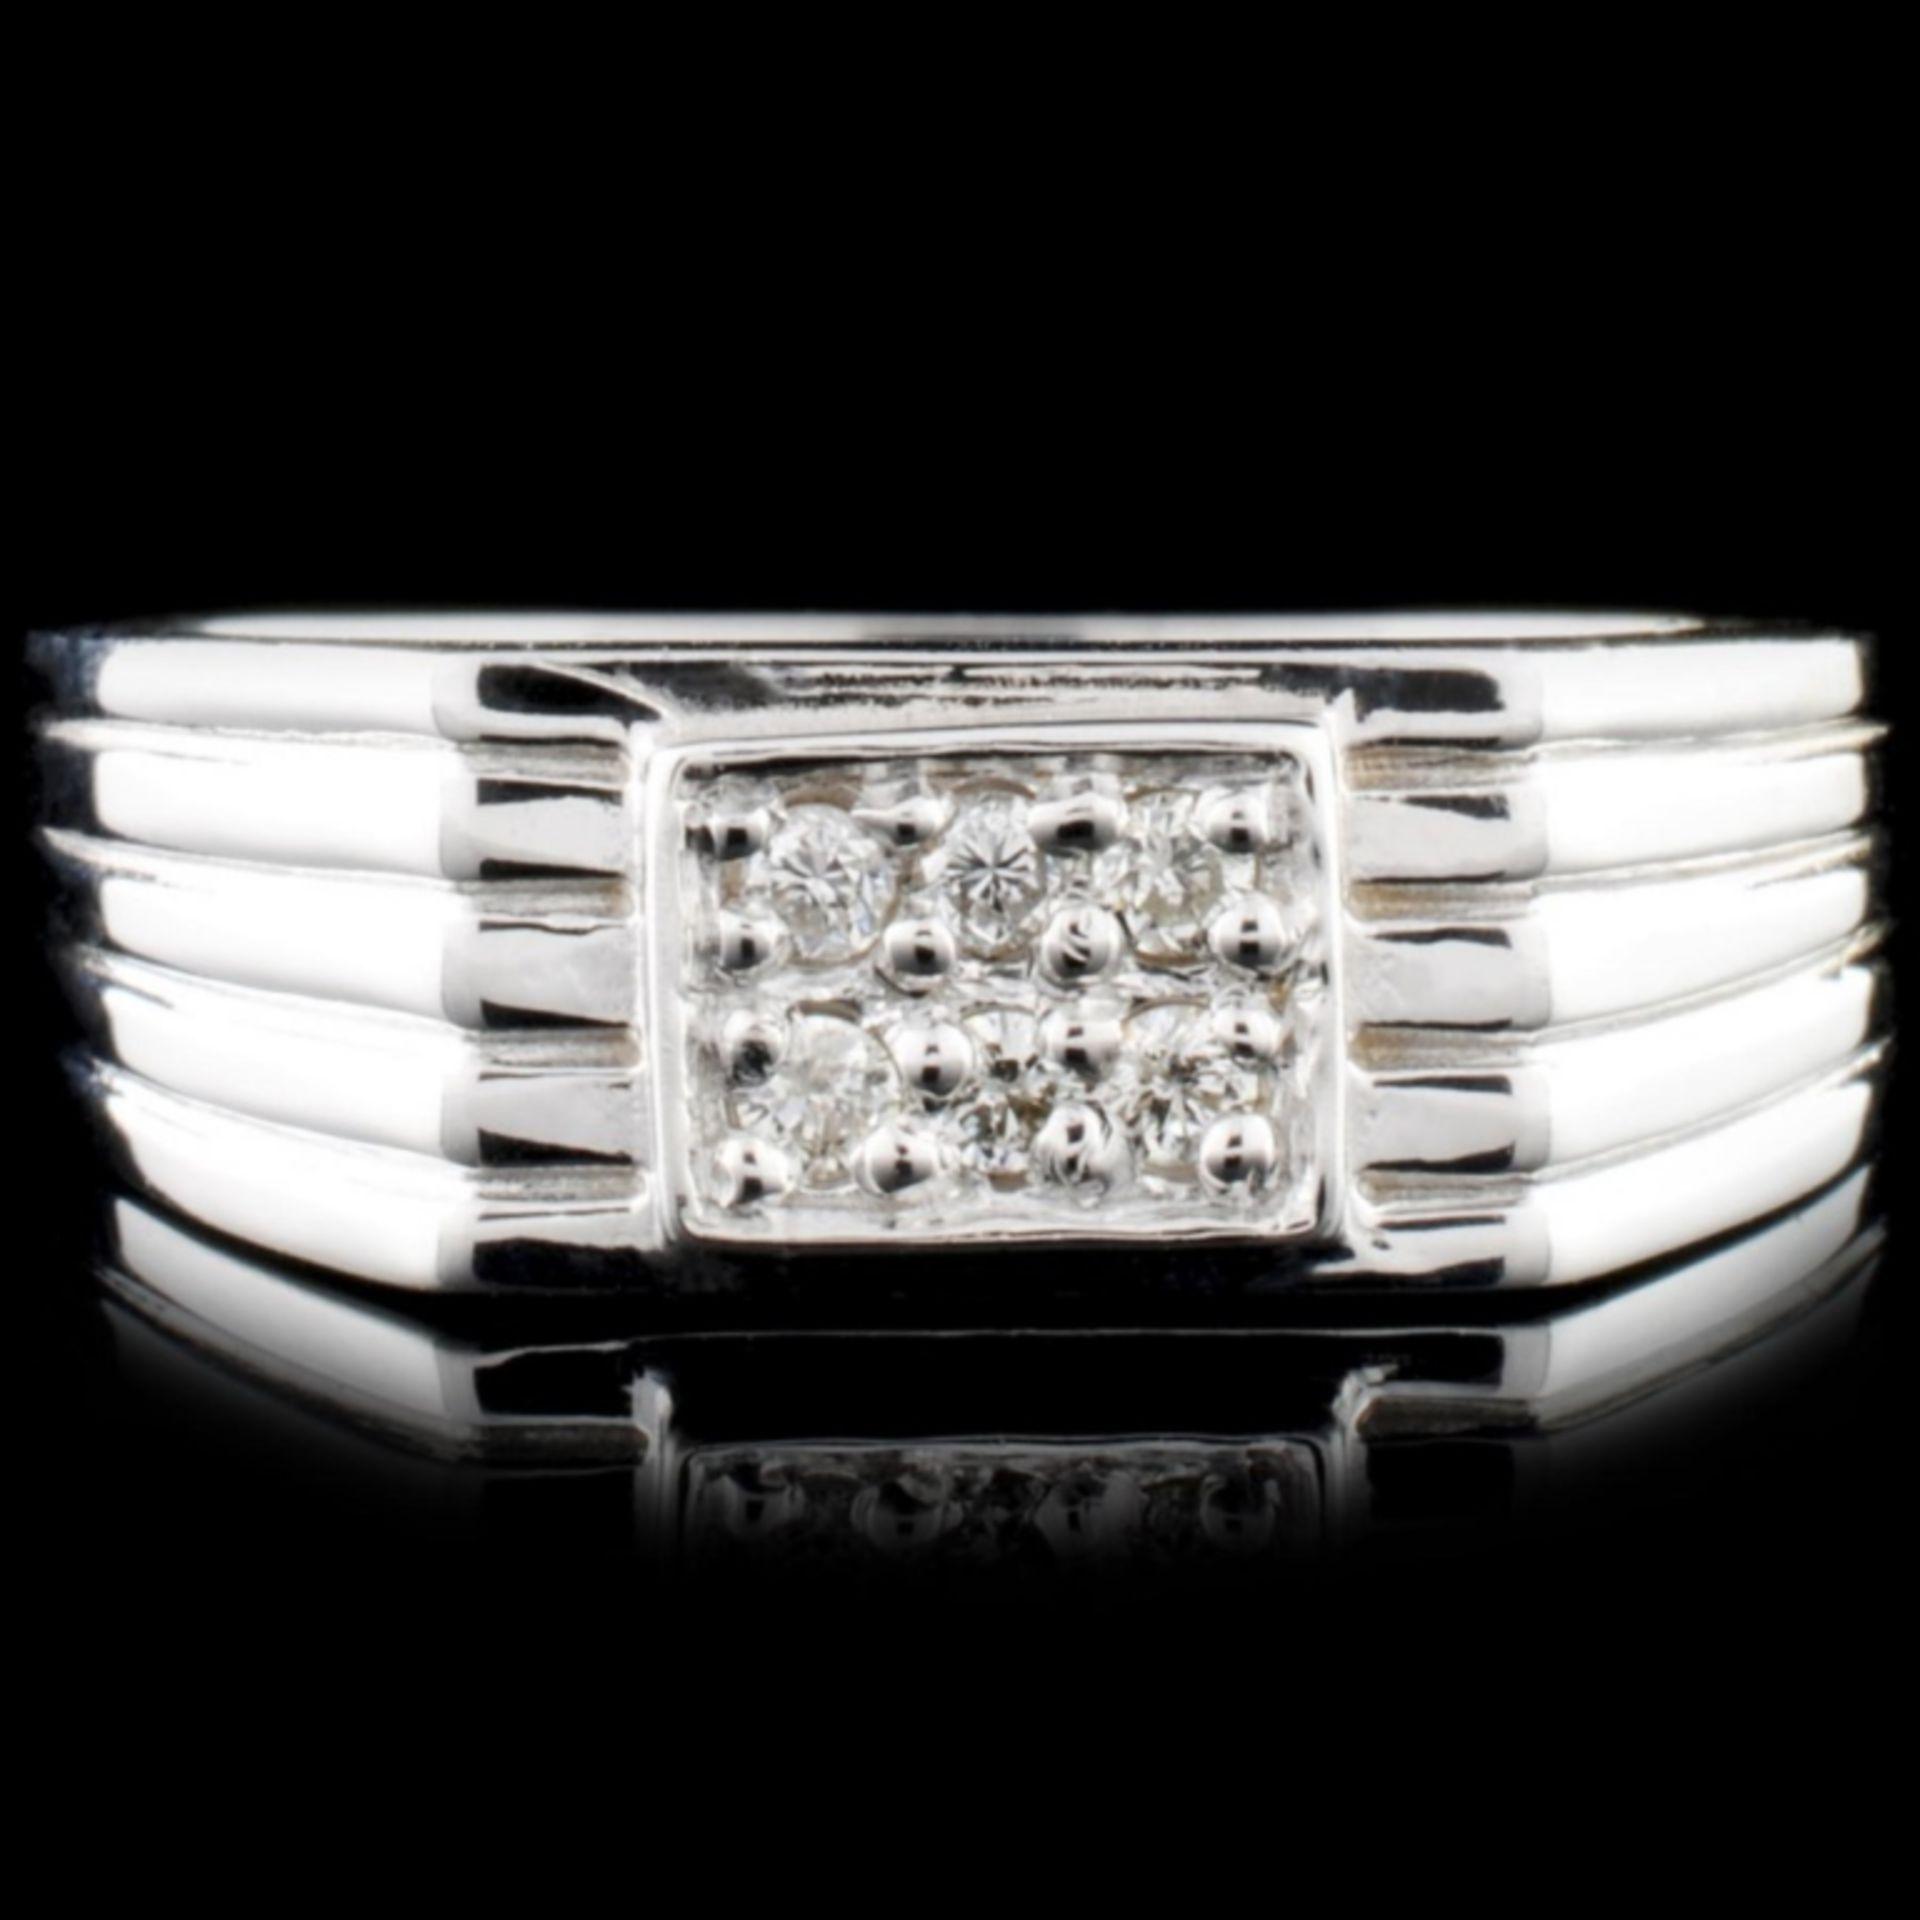 14K Gold 0.11ctw Diamond Ring - Image 2 of 3